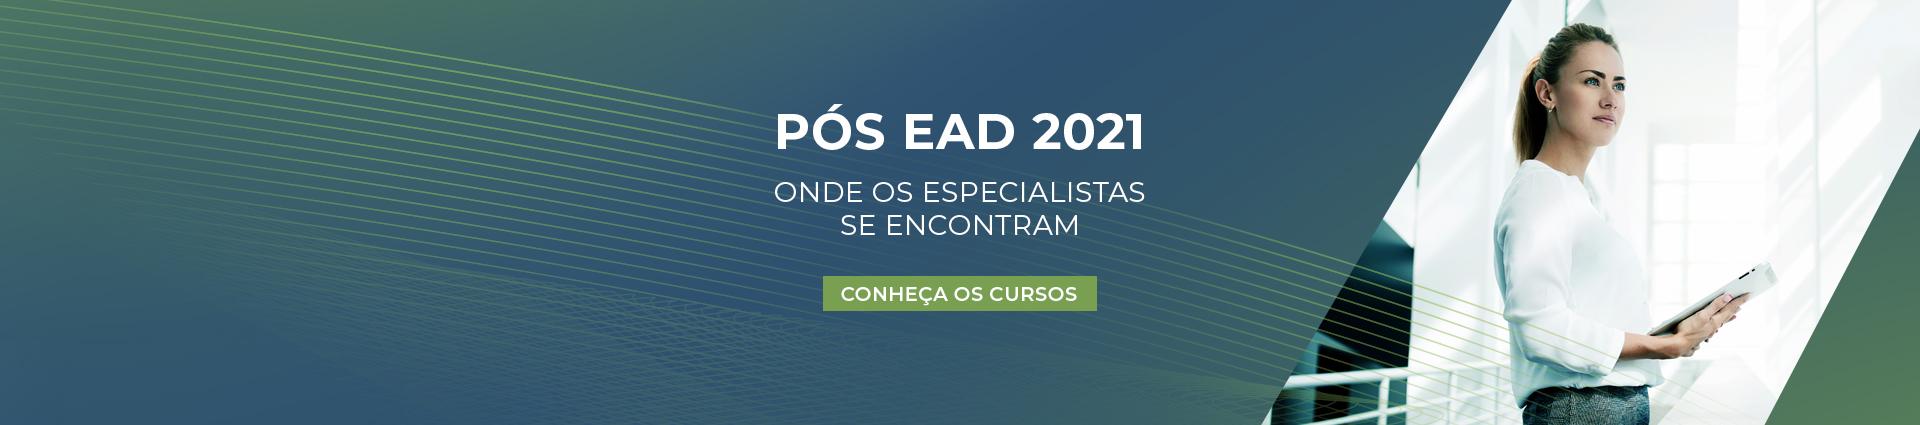 Banner_Pos_EAD_2021